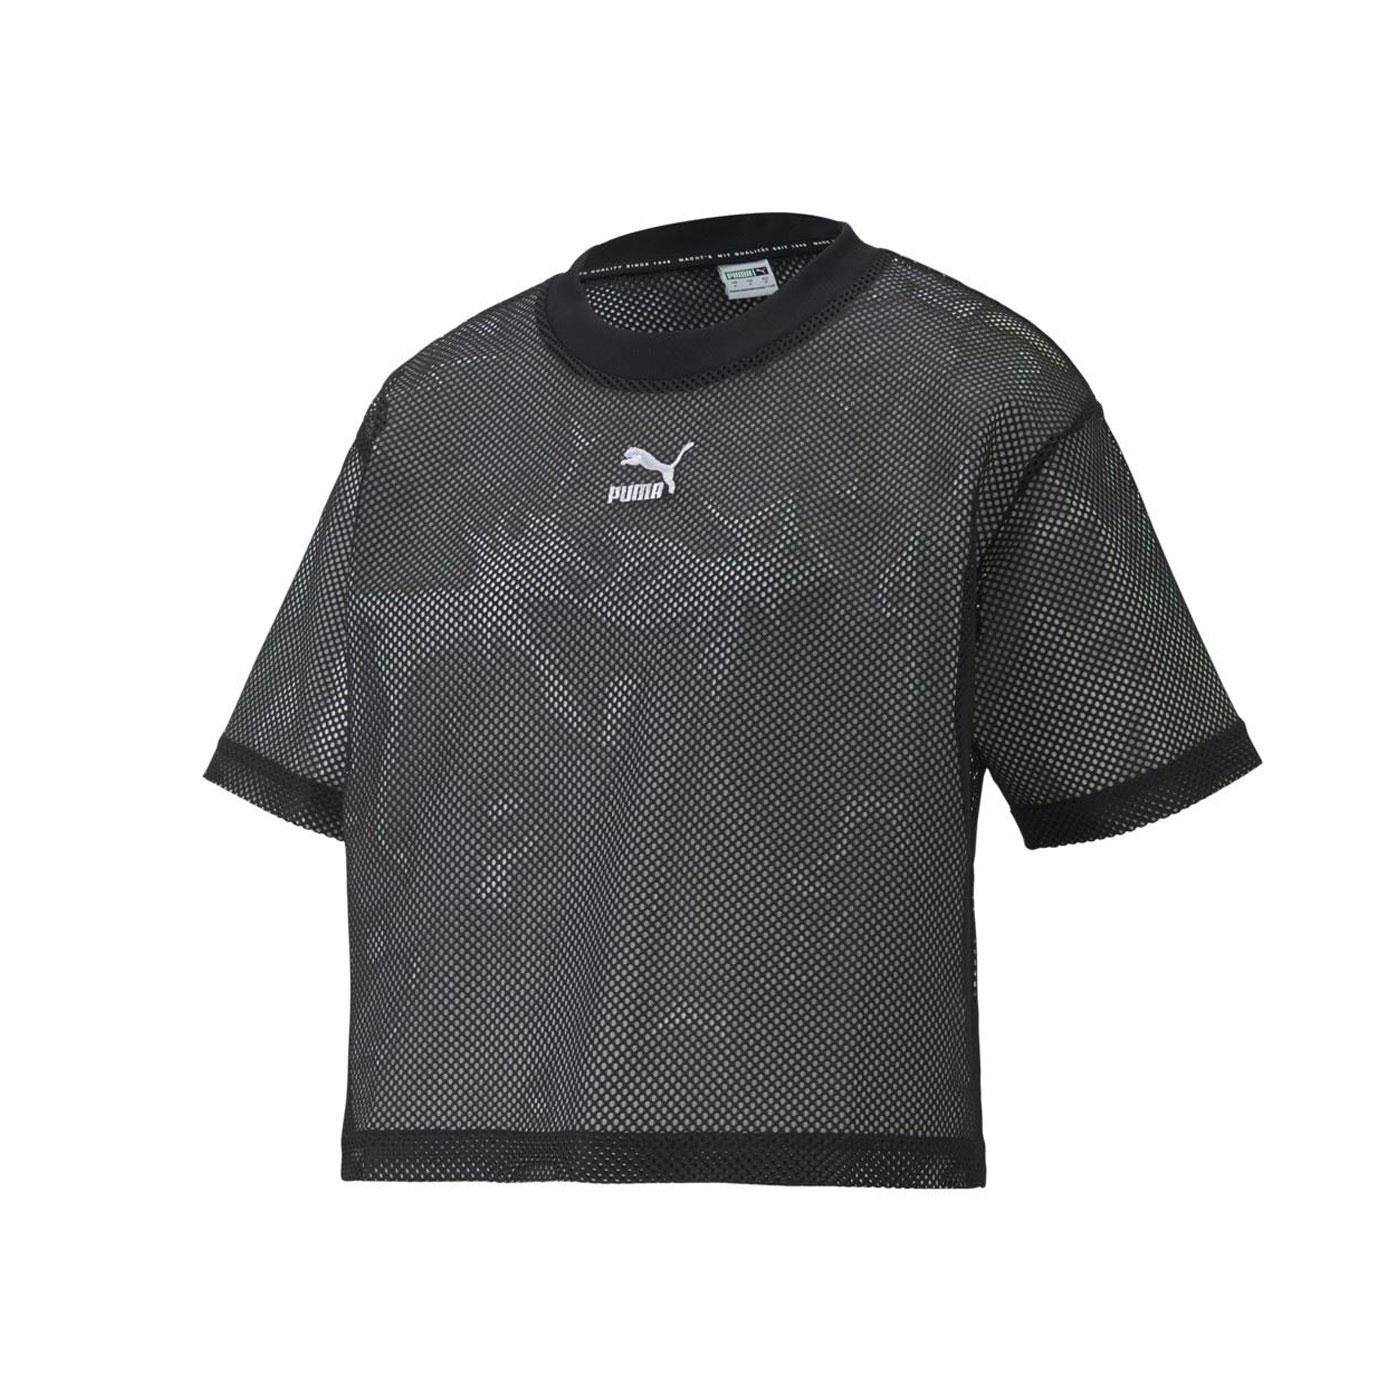 PUMA 女款流行系列Classics短袖T恤 59861601 - 黑白